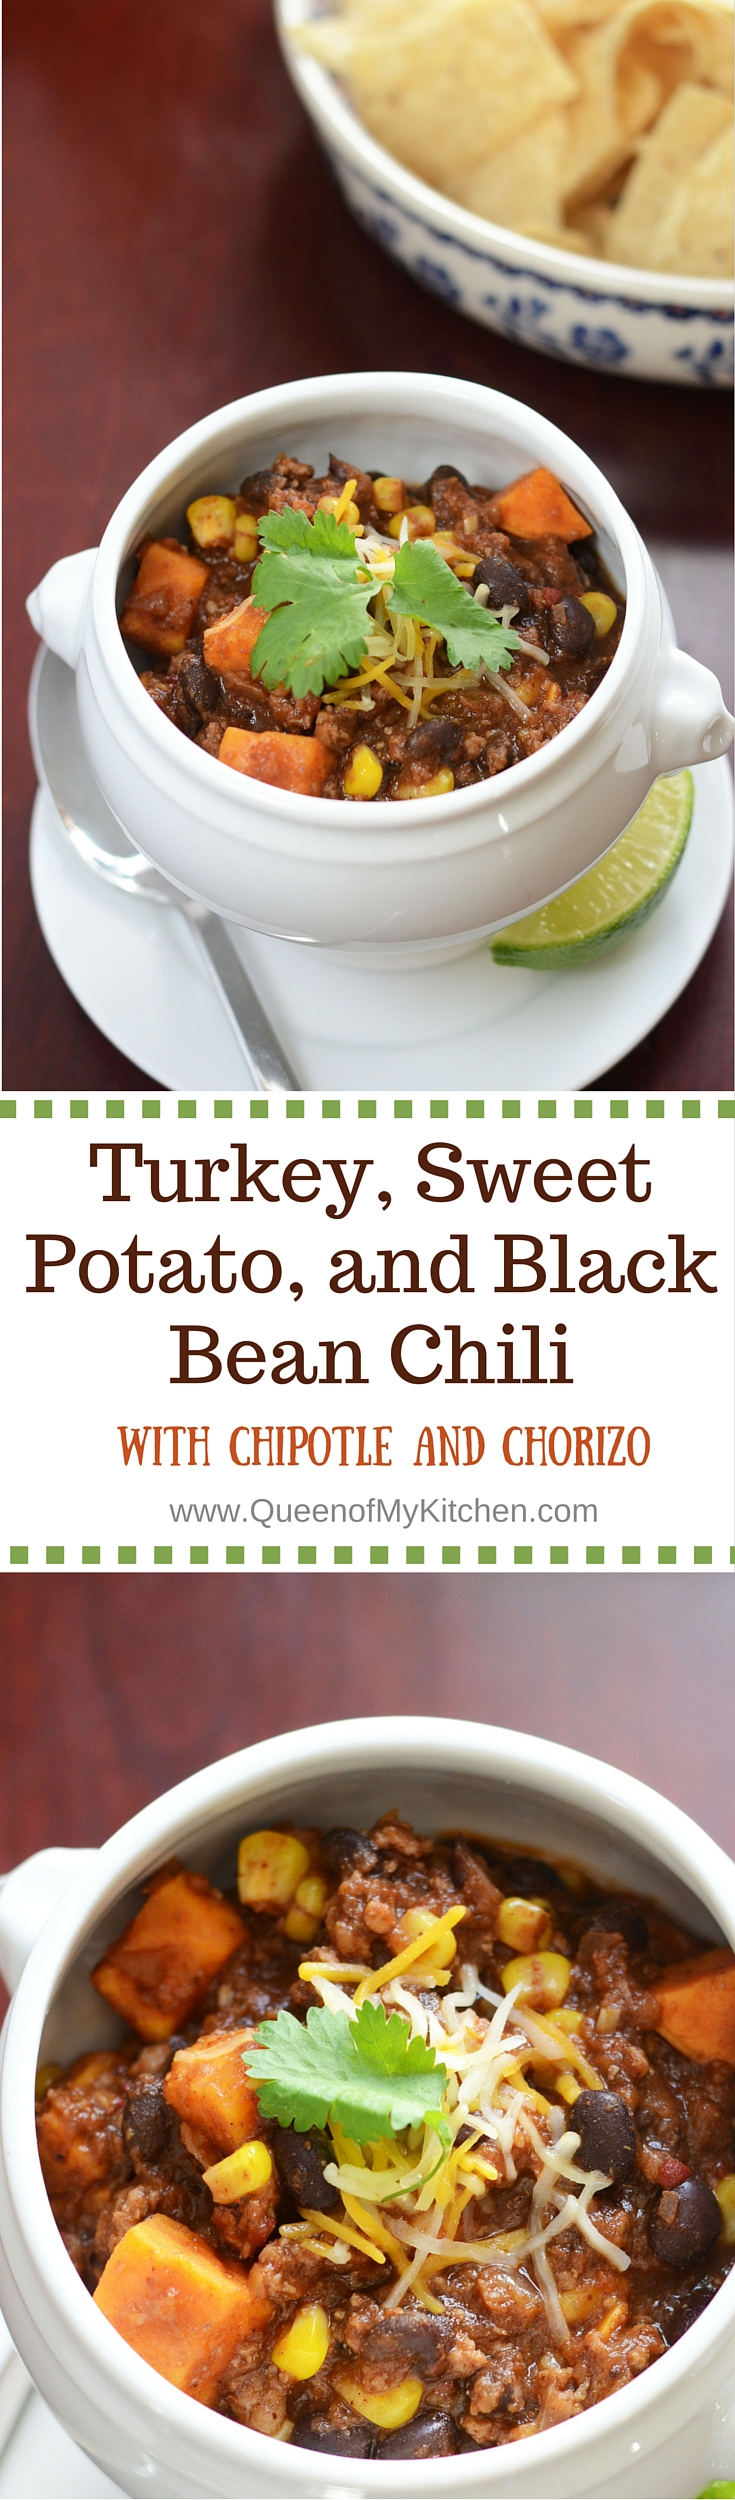 Turkey, Sweet Potato, and Black Bean Chili with Chipotle ...